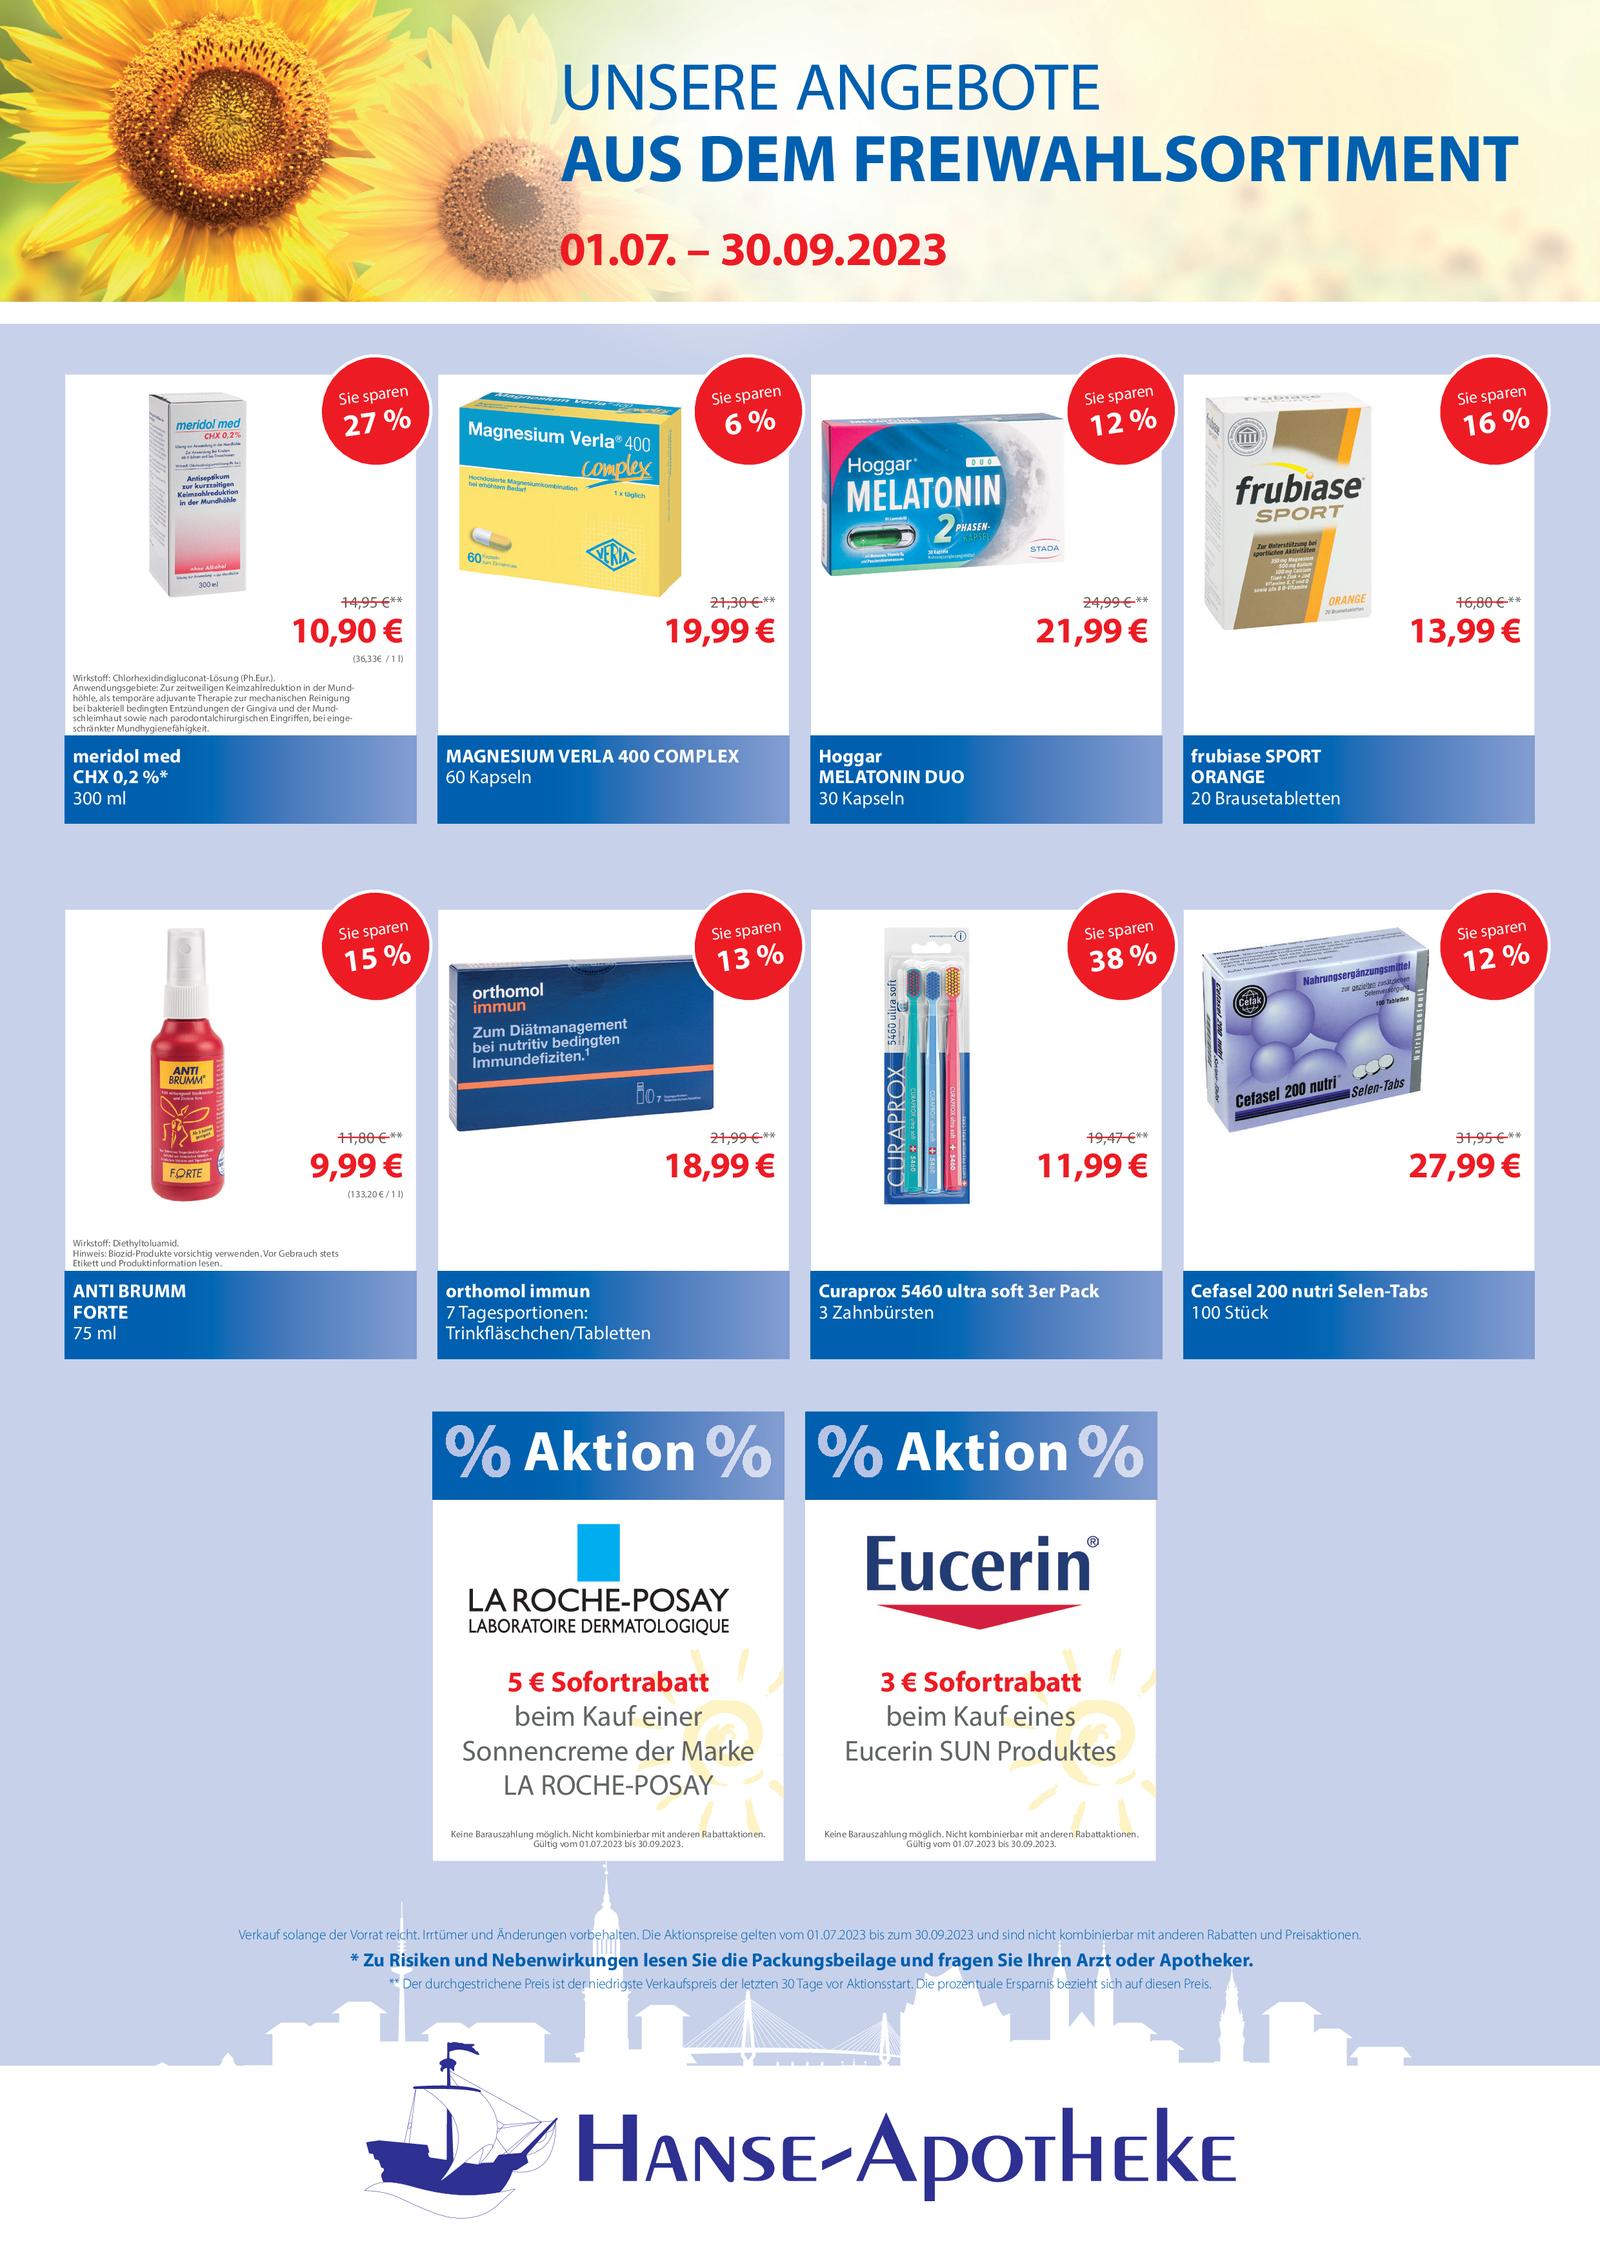 https://mein-uploads.apocdn.net/17066/leaflets/17066_flyer-Seite2.png